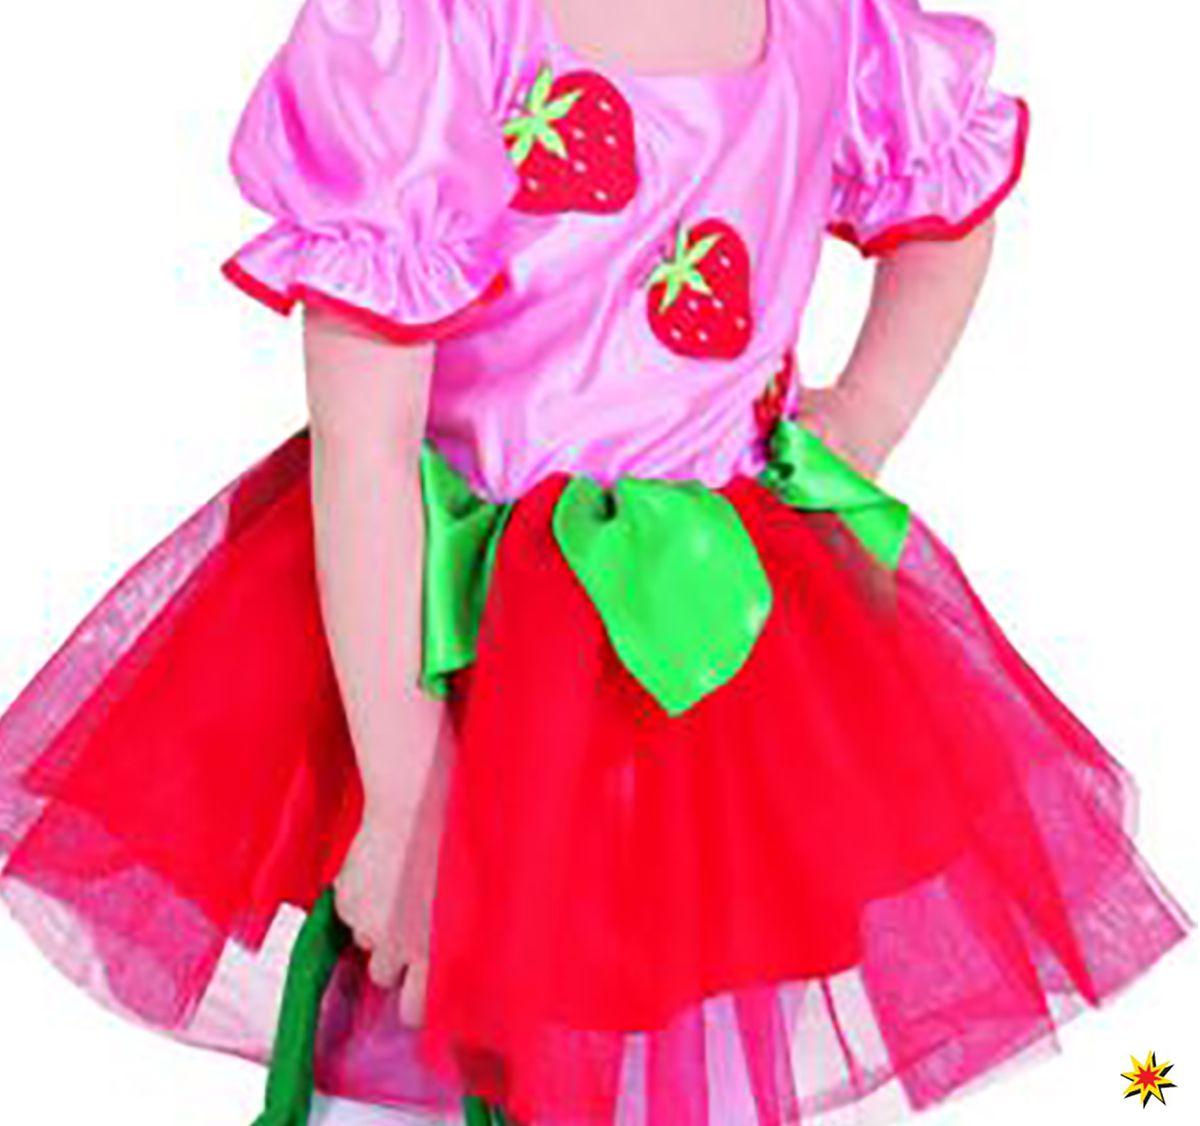 Kinderkostum Erdbeermadchen Kleid Erdbeer Fee